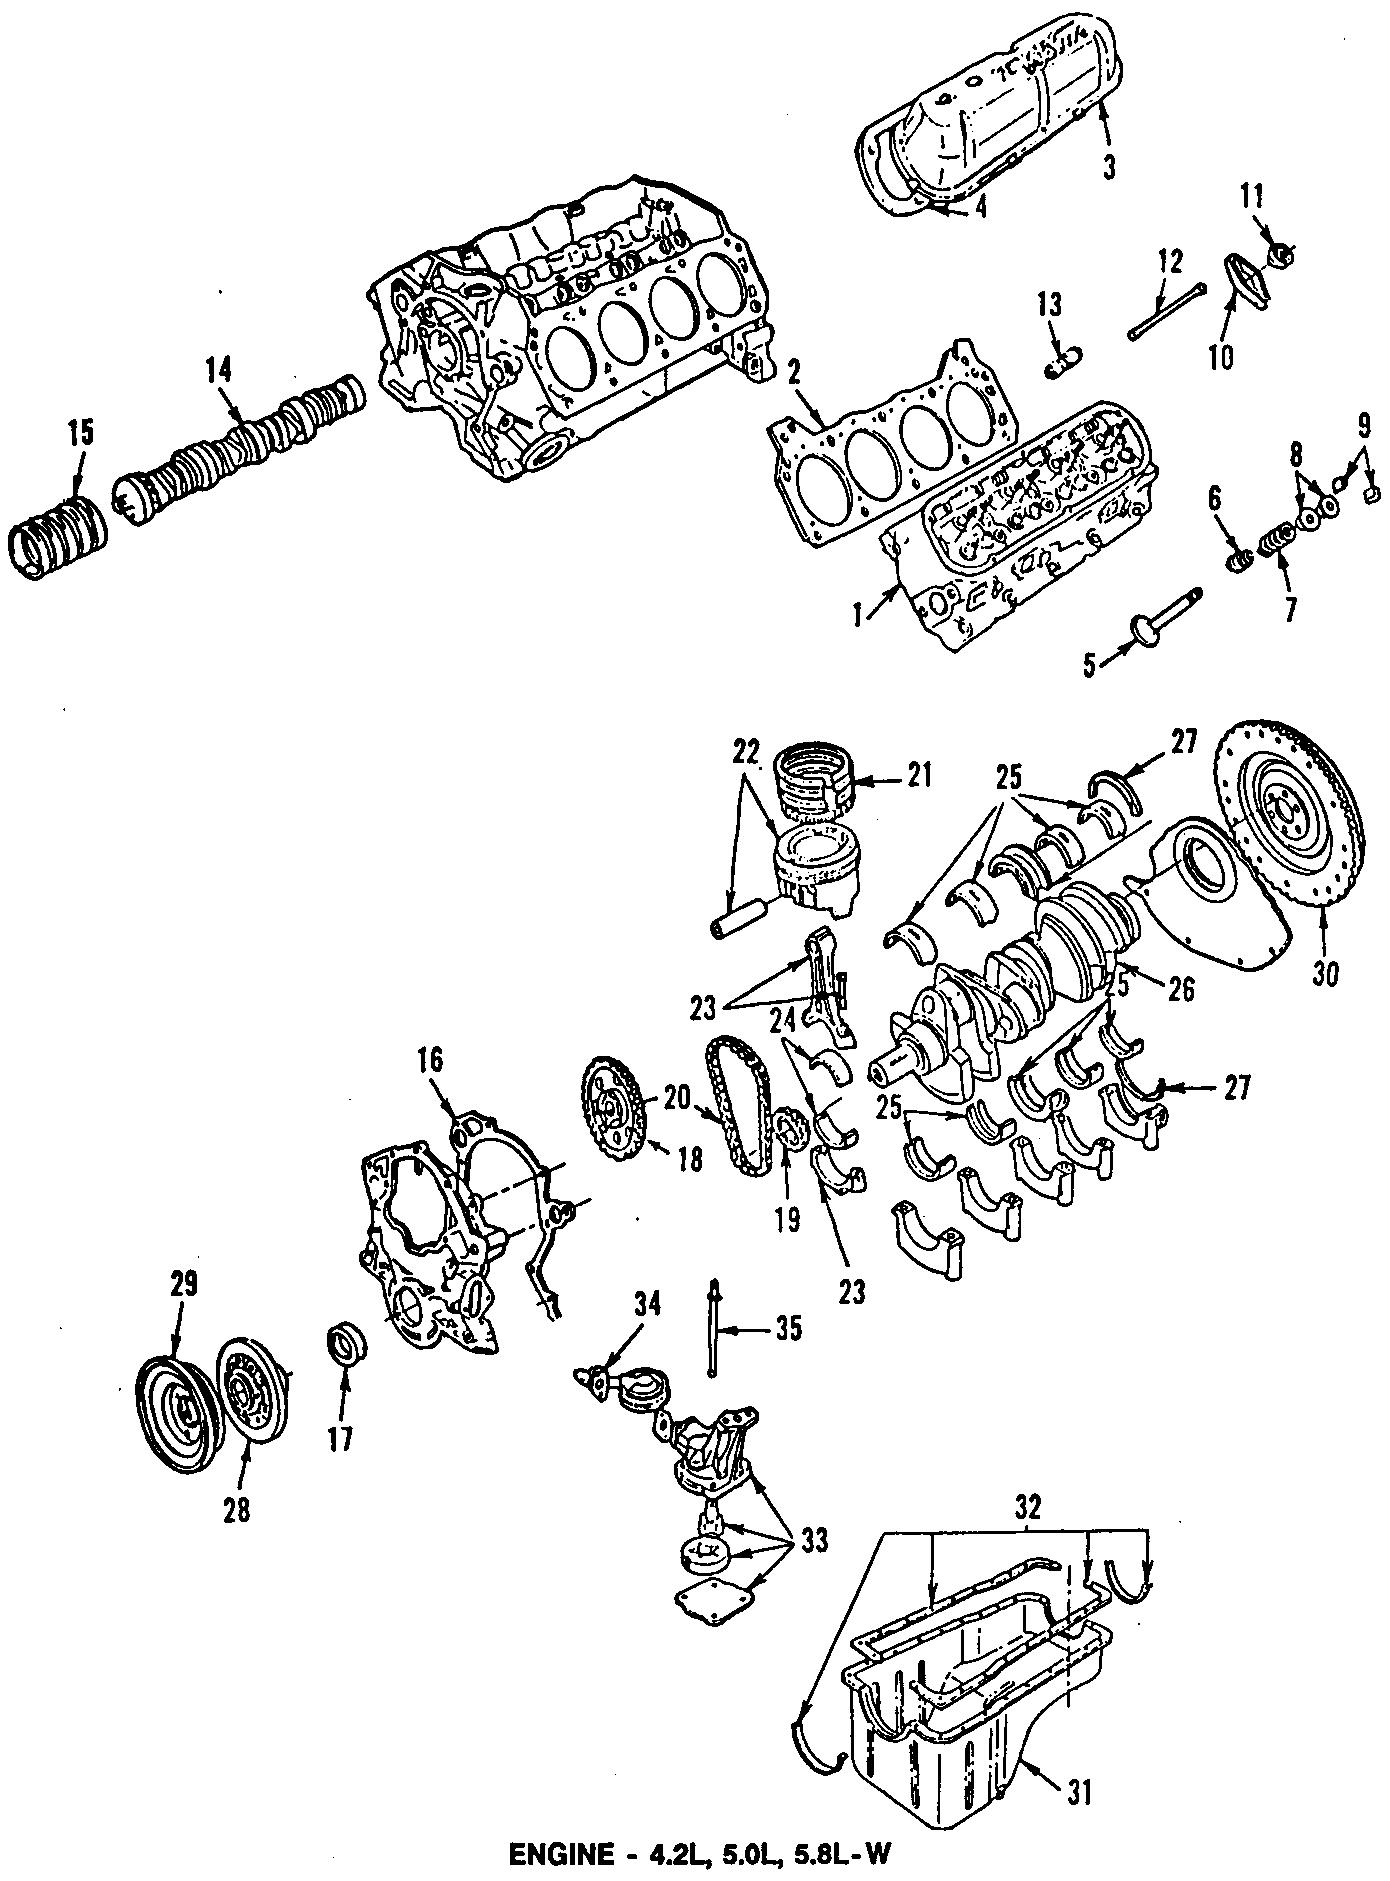 Ford F-250 Engine Oil Pan Gasket. Engine Oil Pan Gasket